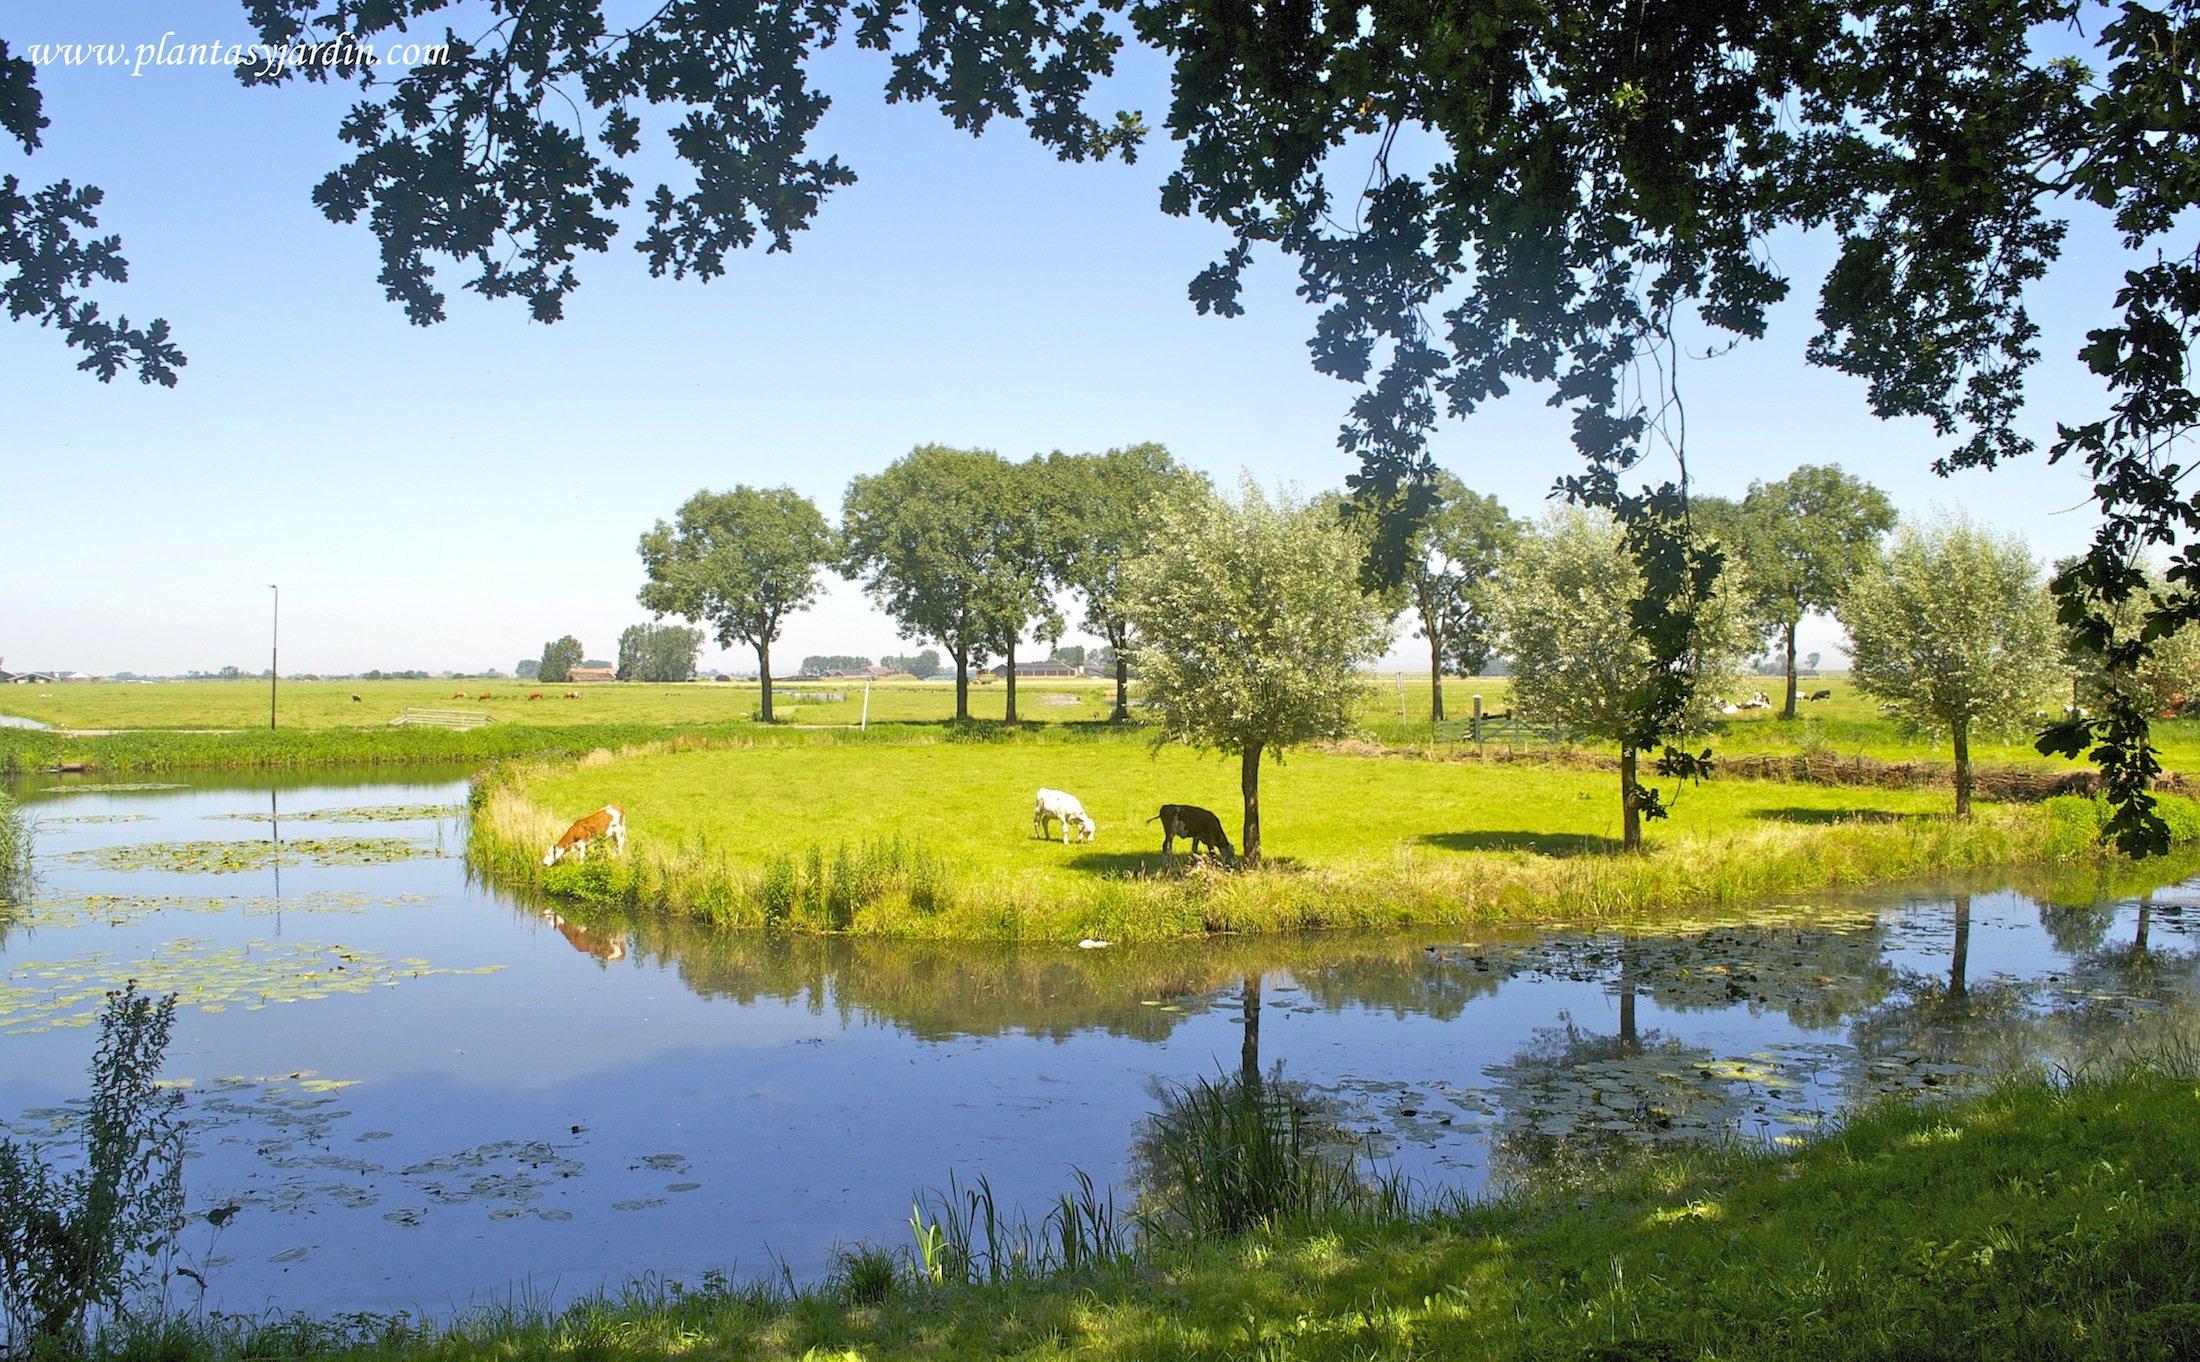 el campo holandés, Voladem en Edam, norte de Ámsterdam